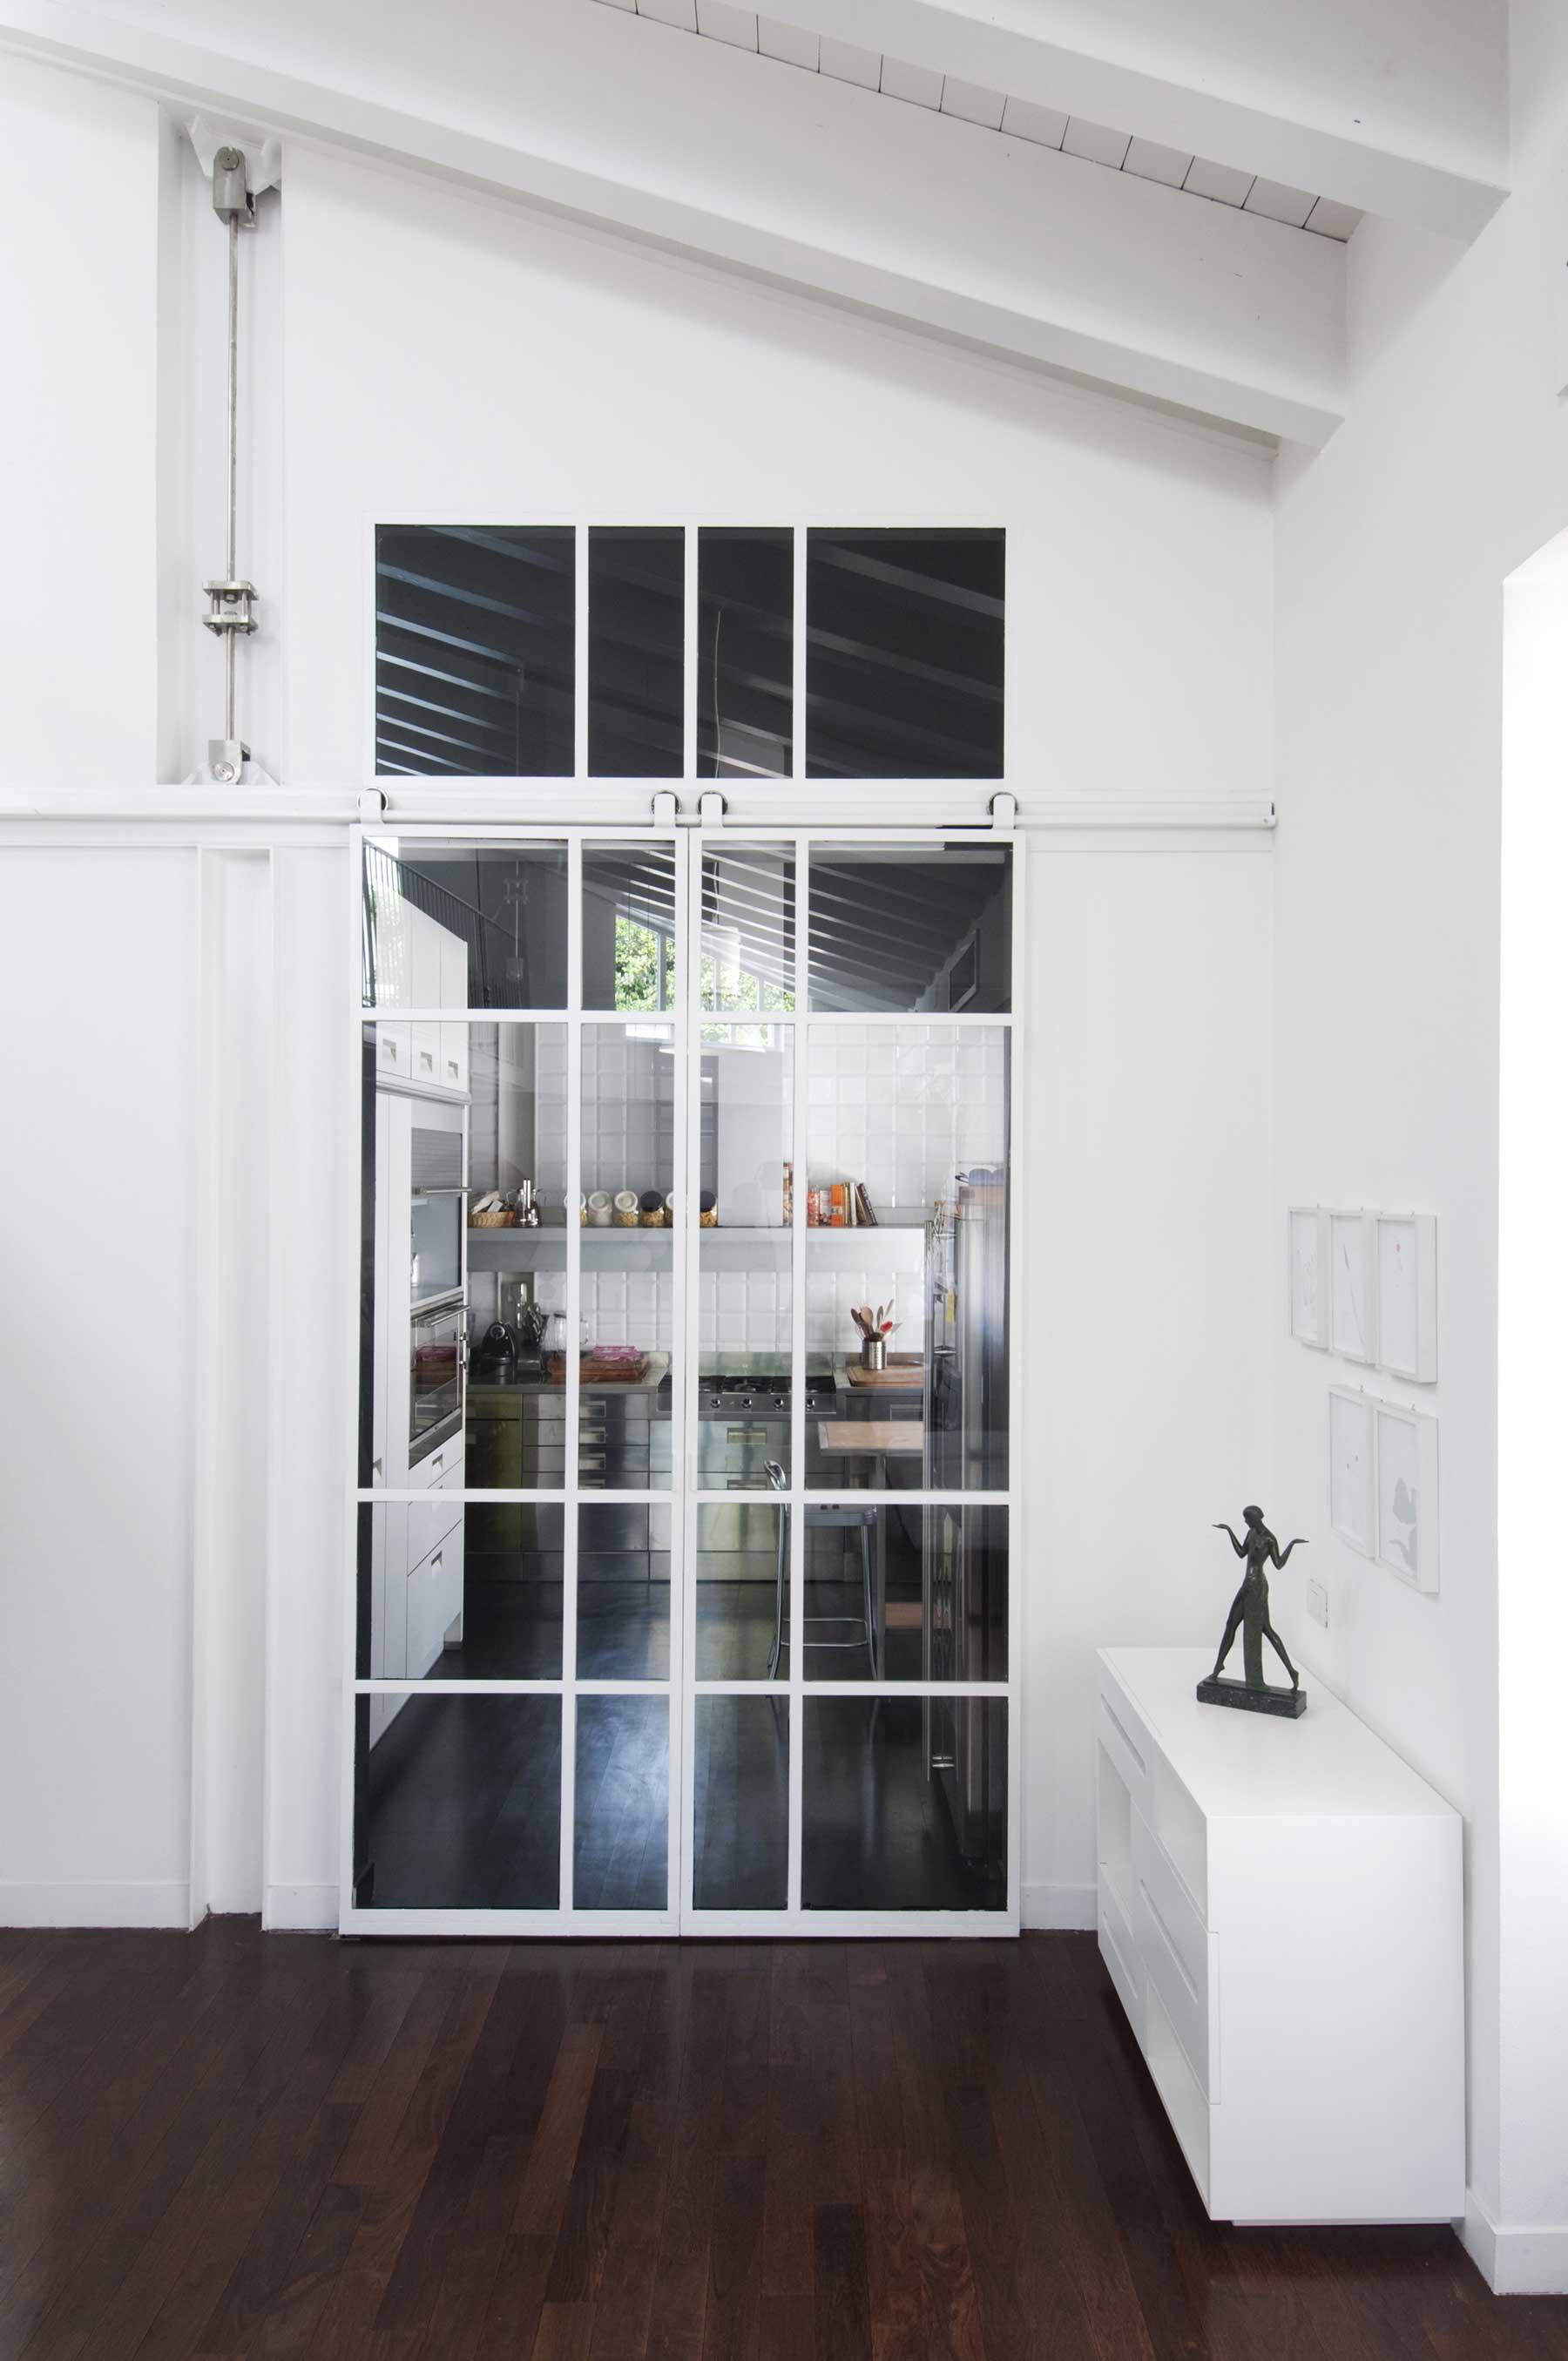 cuisine avec portes coulissantes en verre. Black Bedroom Furniture Sets. Home Design Ideas